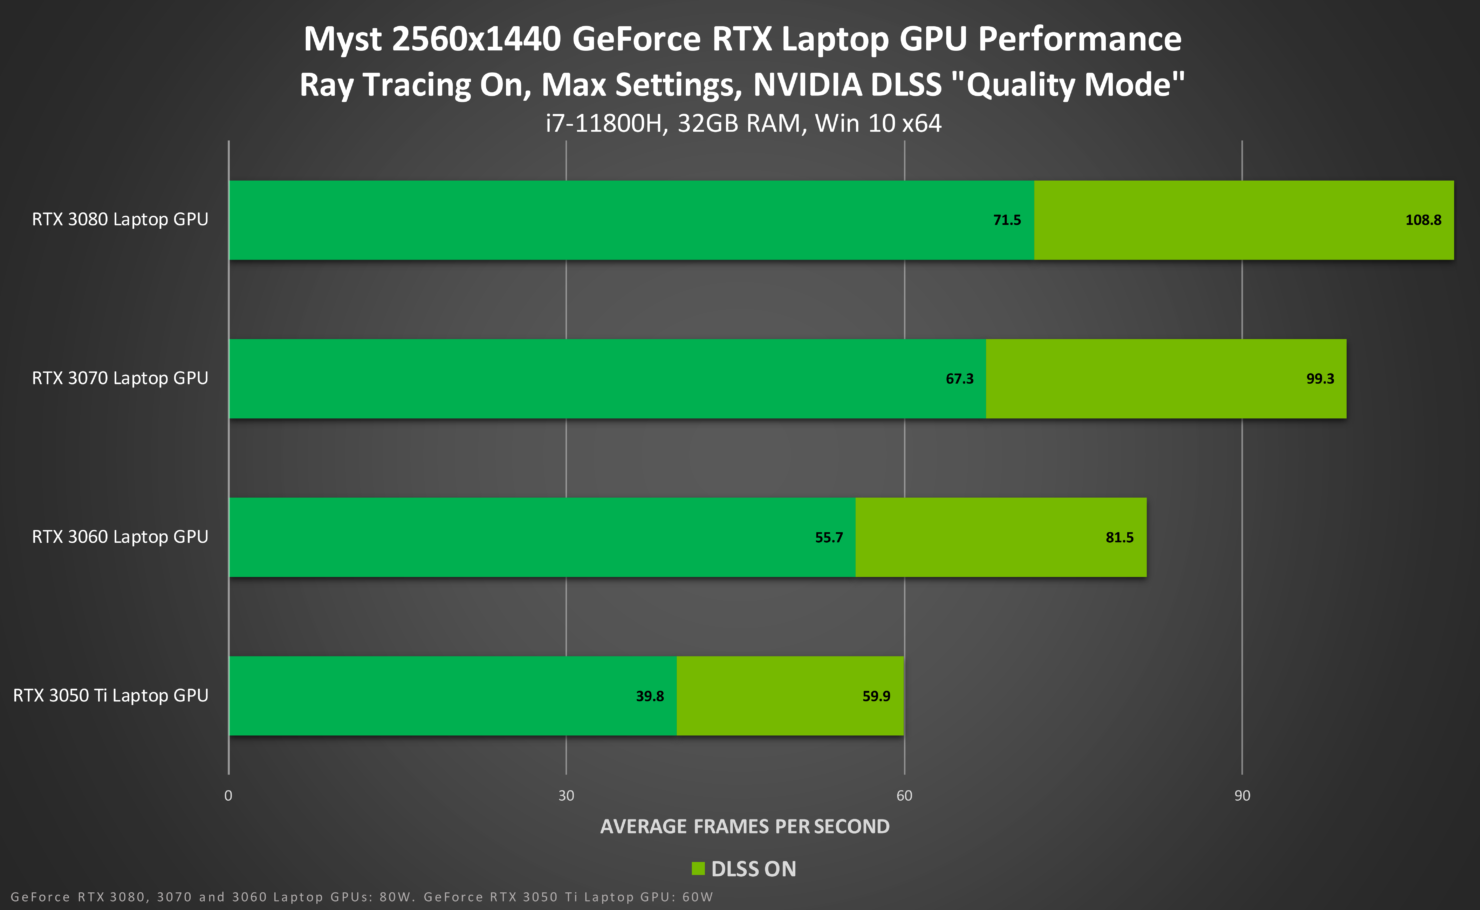 myst-geforce-rtx-2560x1440-ray-tracing-on-nvidia-dlss-laptop-gpu-performance